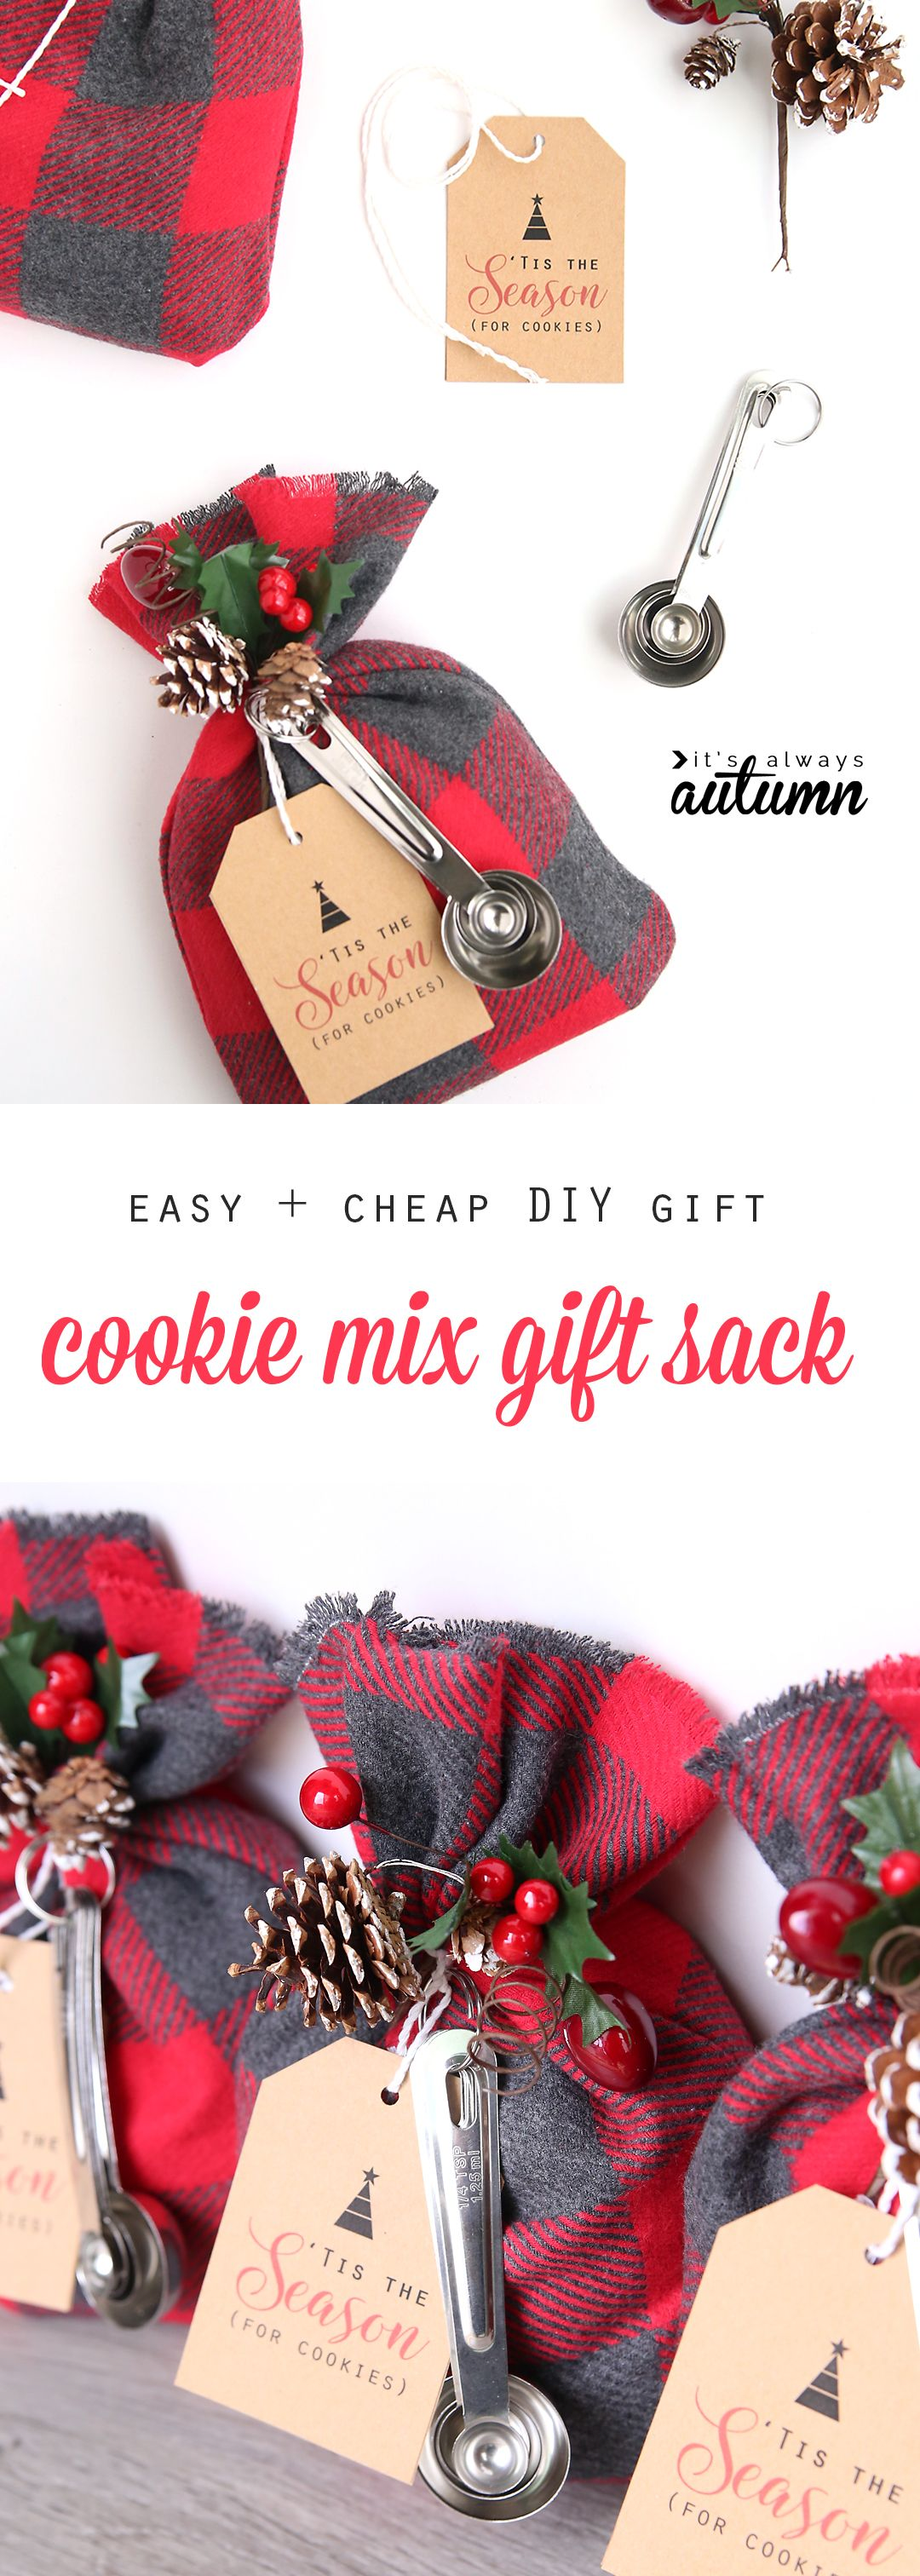 Christmas name ornaments - These Cookie Mix Gift Sacks Make An Adorable Handmade Christmas Gift And They Re